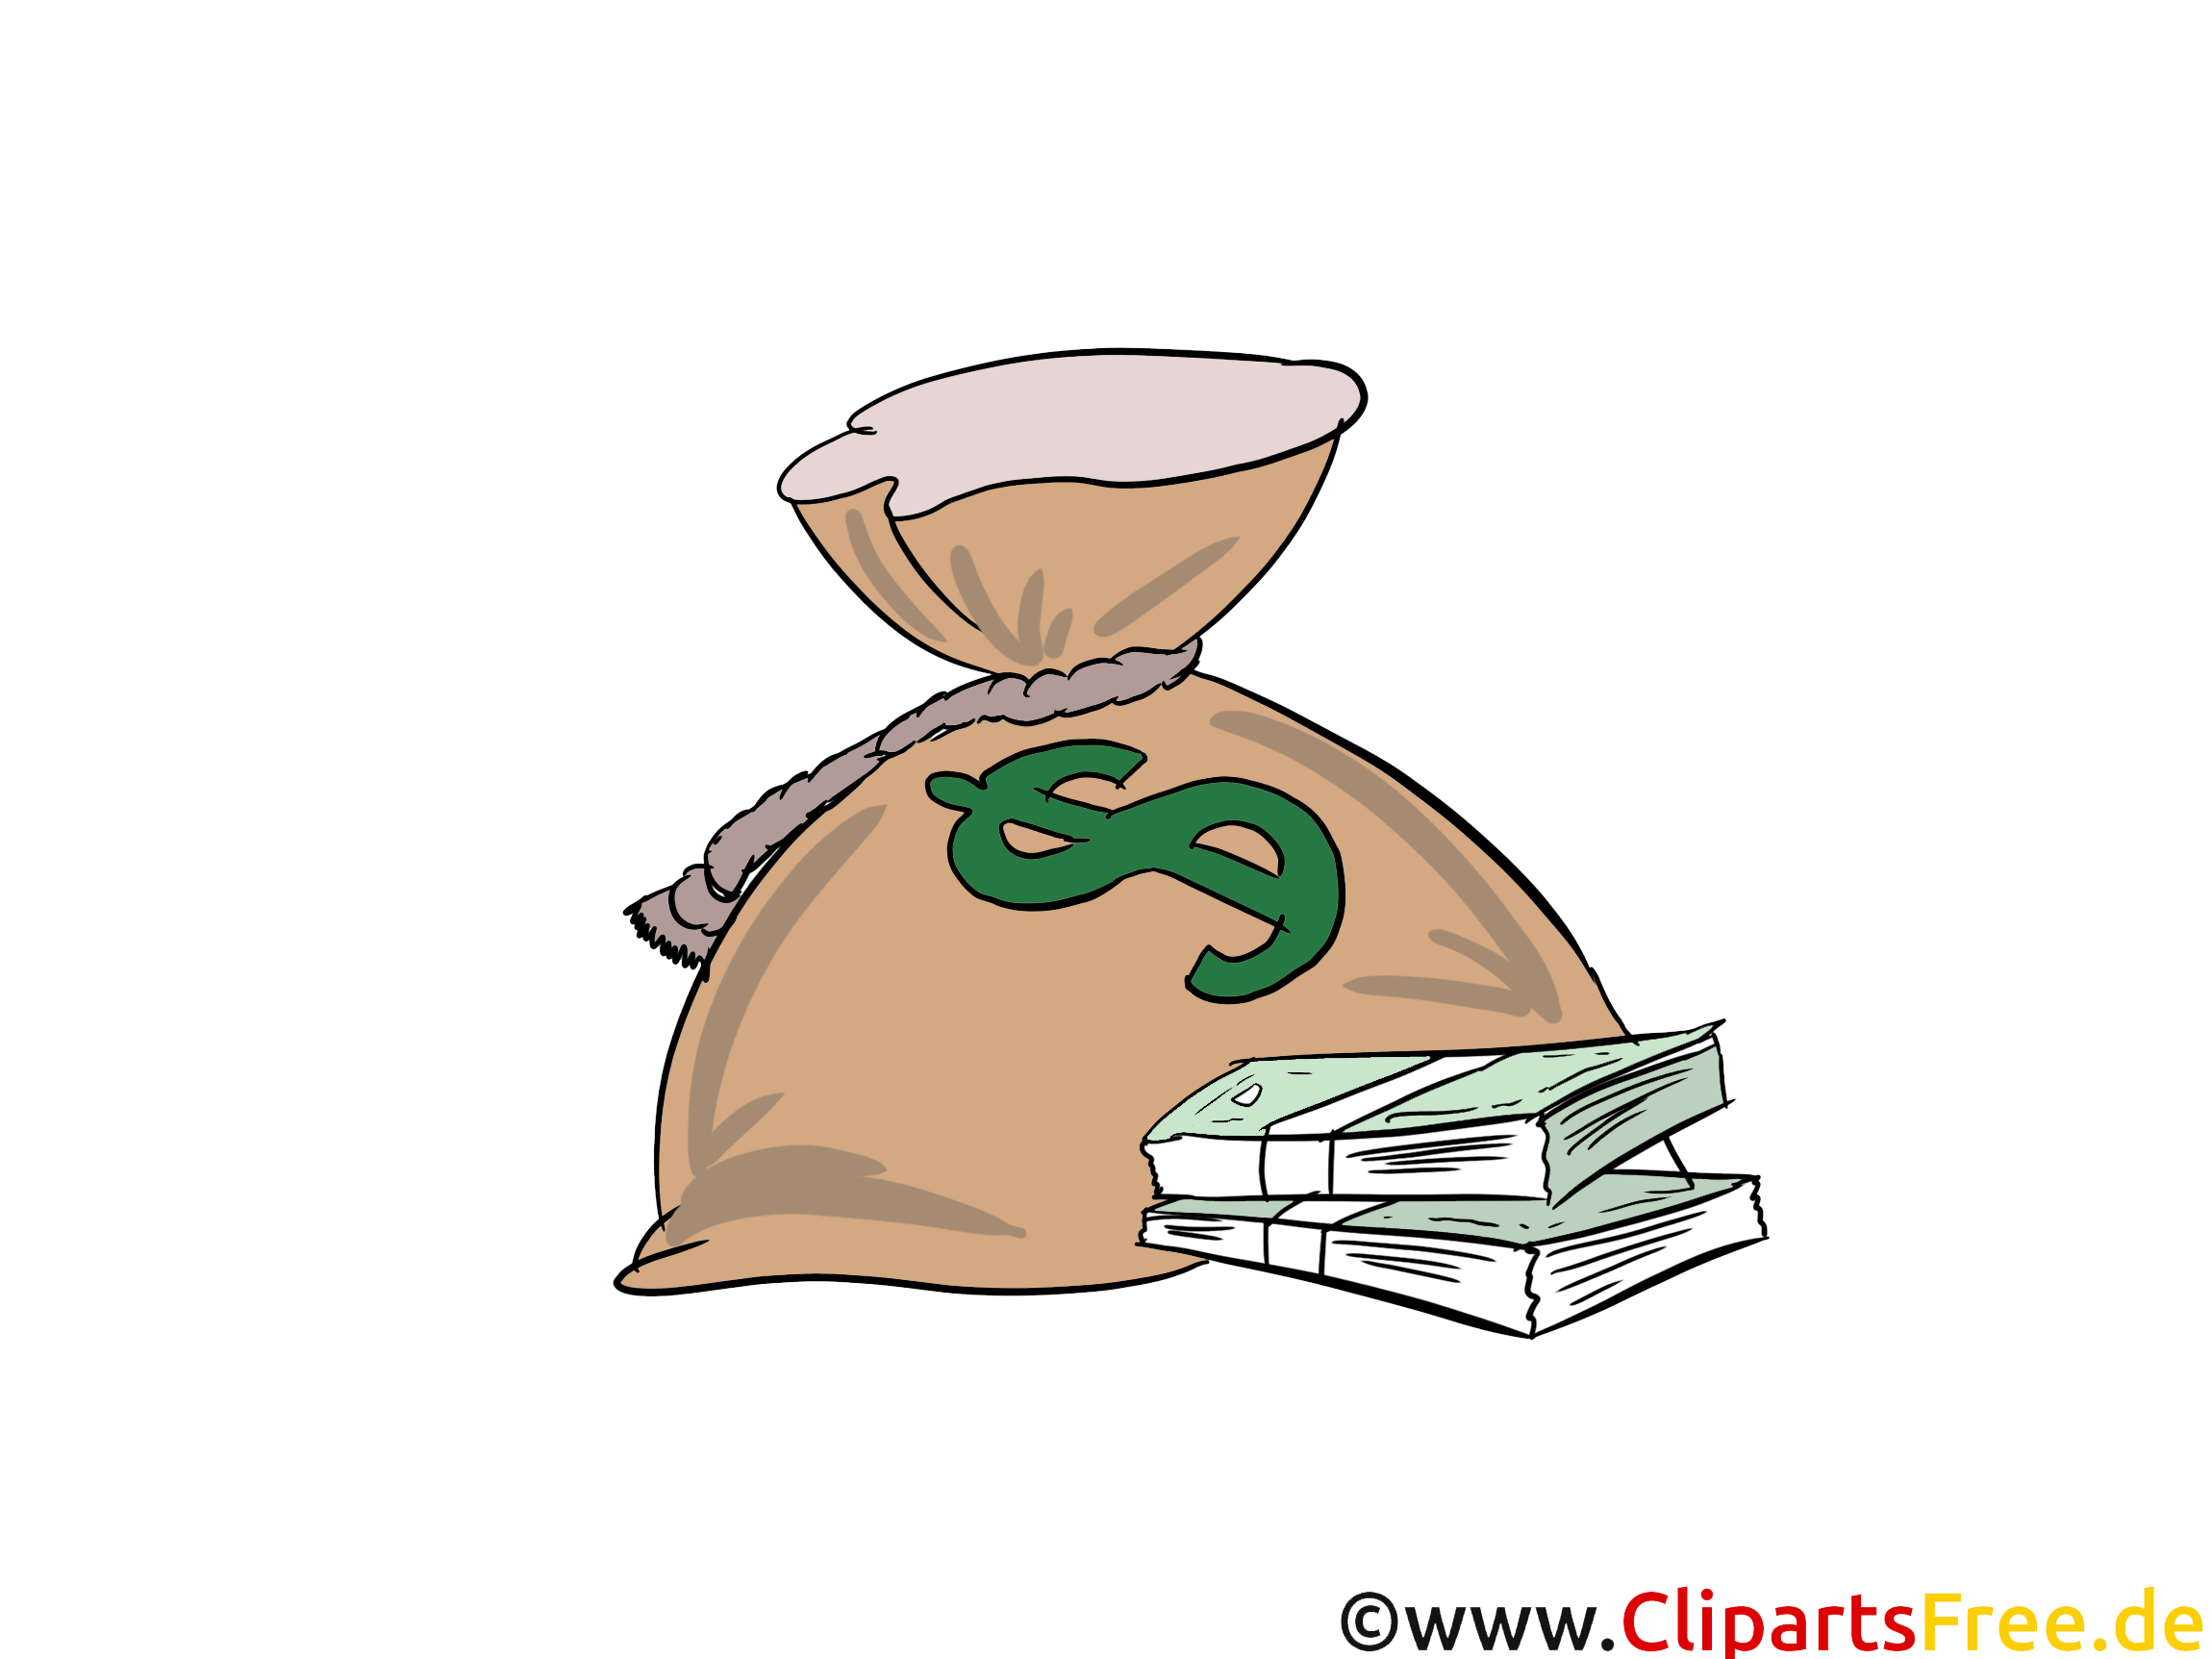 Kapital Clip Art, Bild, Cartoon, Comic, Illustration, Grafik kostenlos